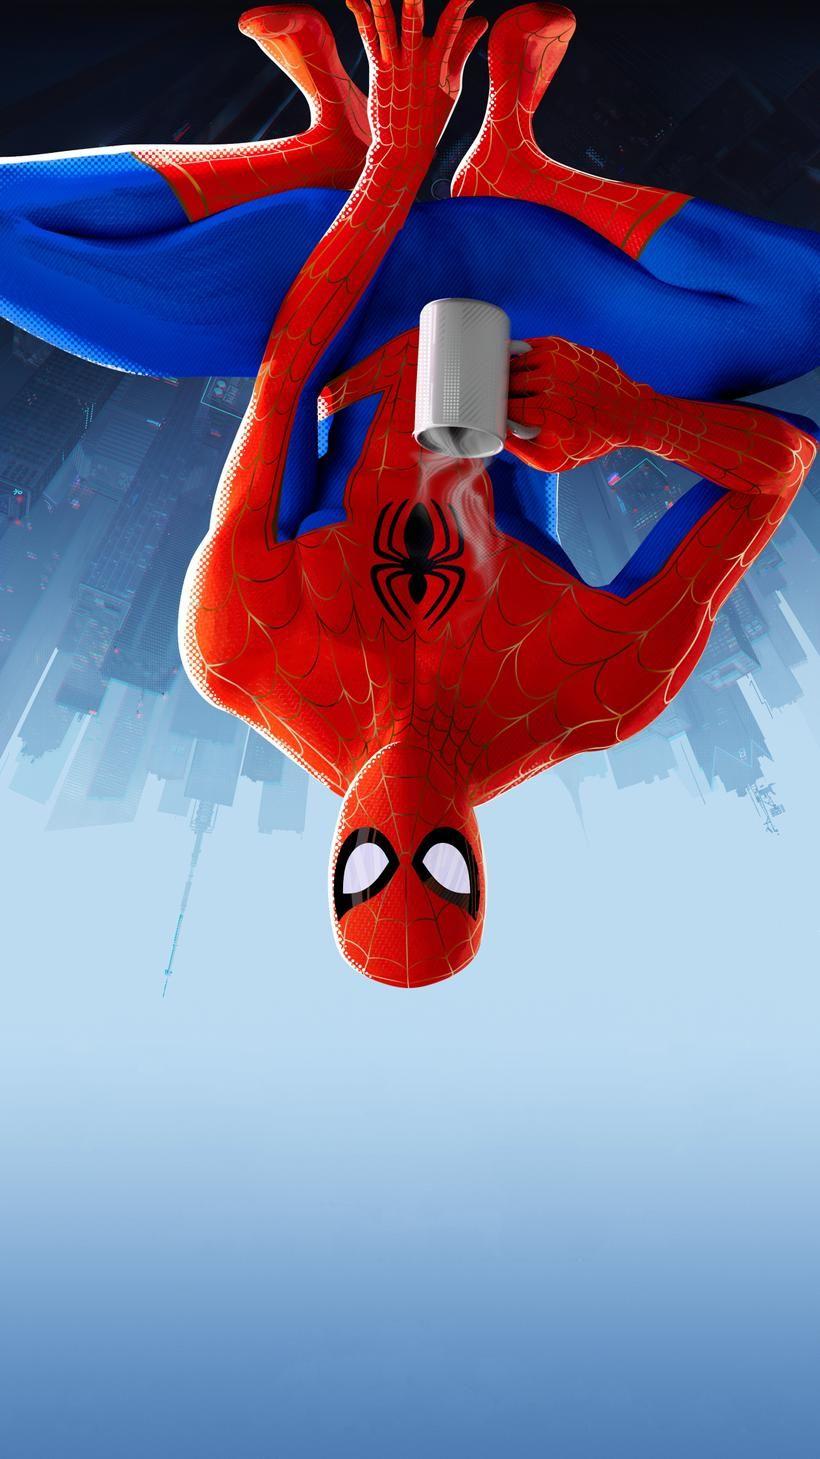 Spiderman Funny Wallpaper : spiderman, funny, wallpaper, 1080p, Spiderman, Funny, Wallpaper